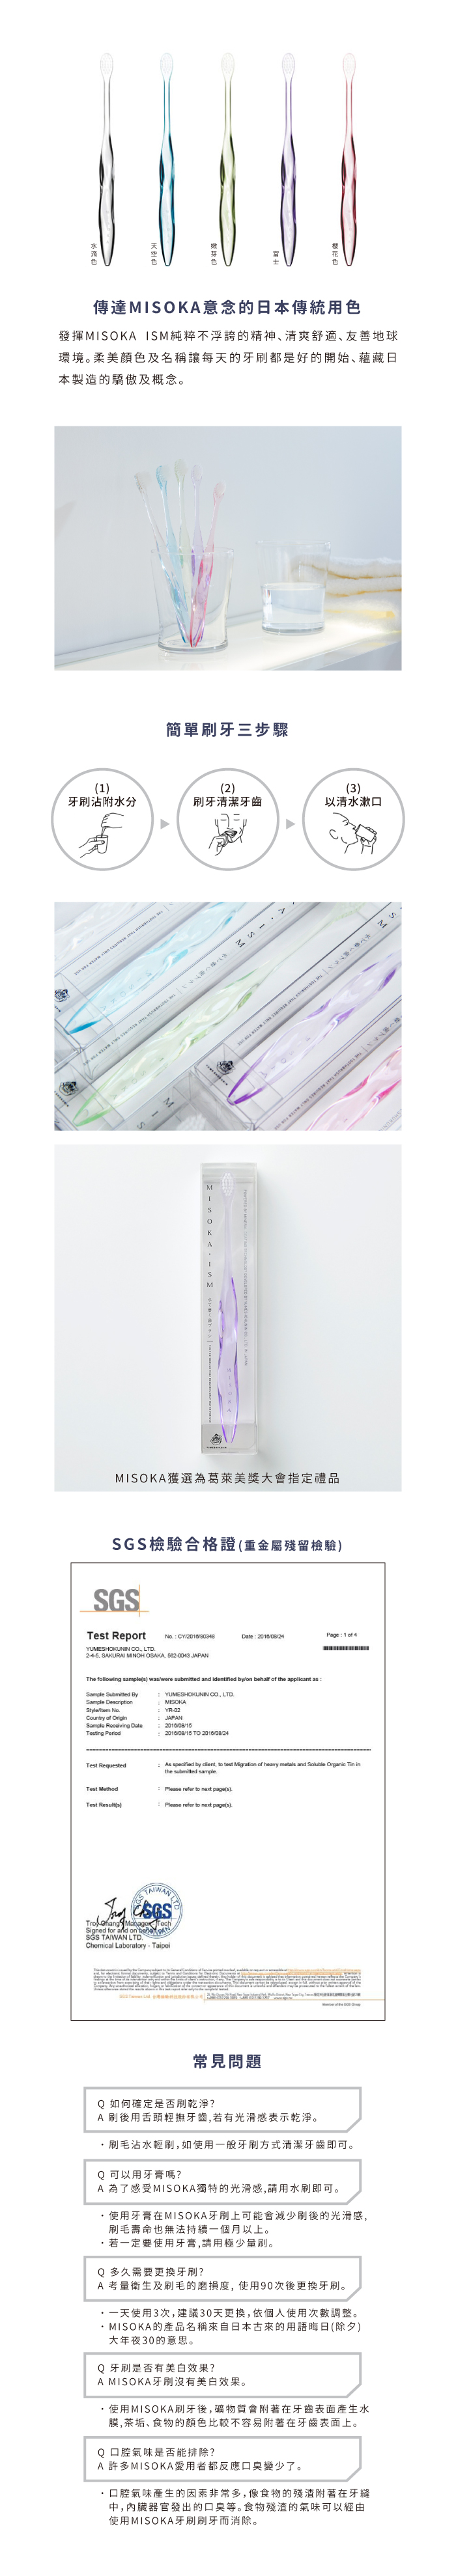 MISOKA │ ISM 免牙膏哲學款牙刷 (日本製 / 嫩芽色)